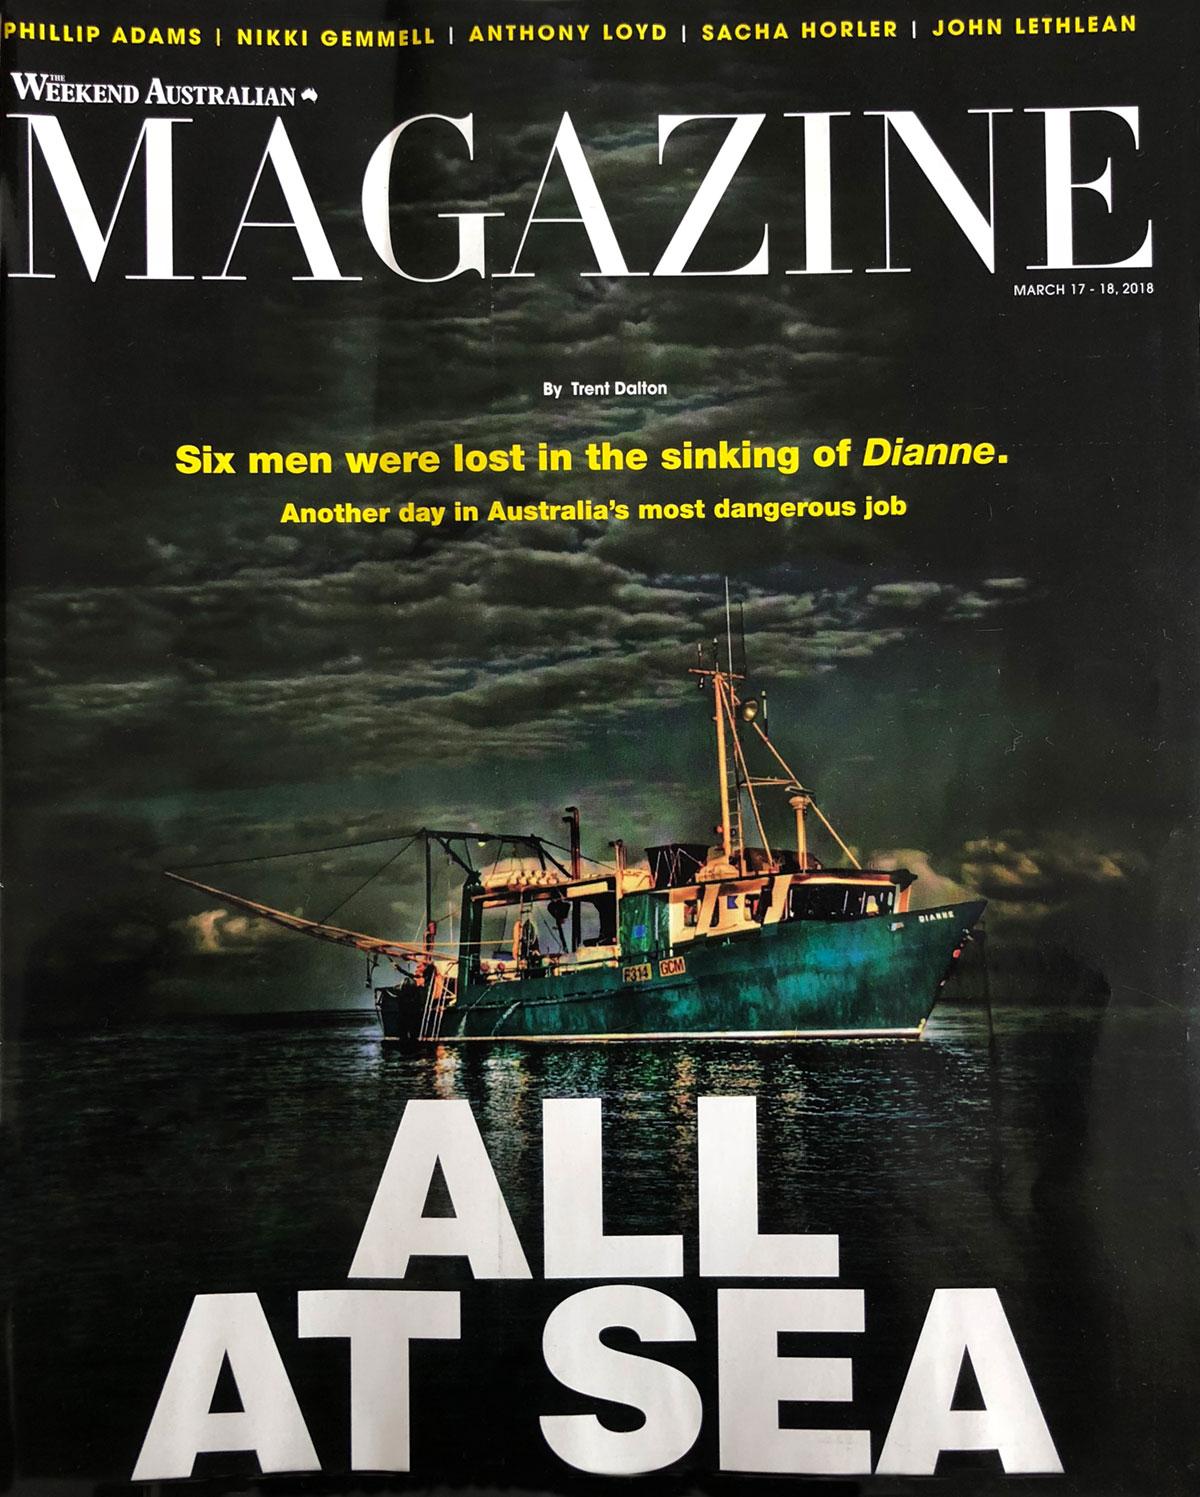 Weekend-Austtalian-Magazine-cover.jpg